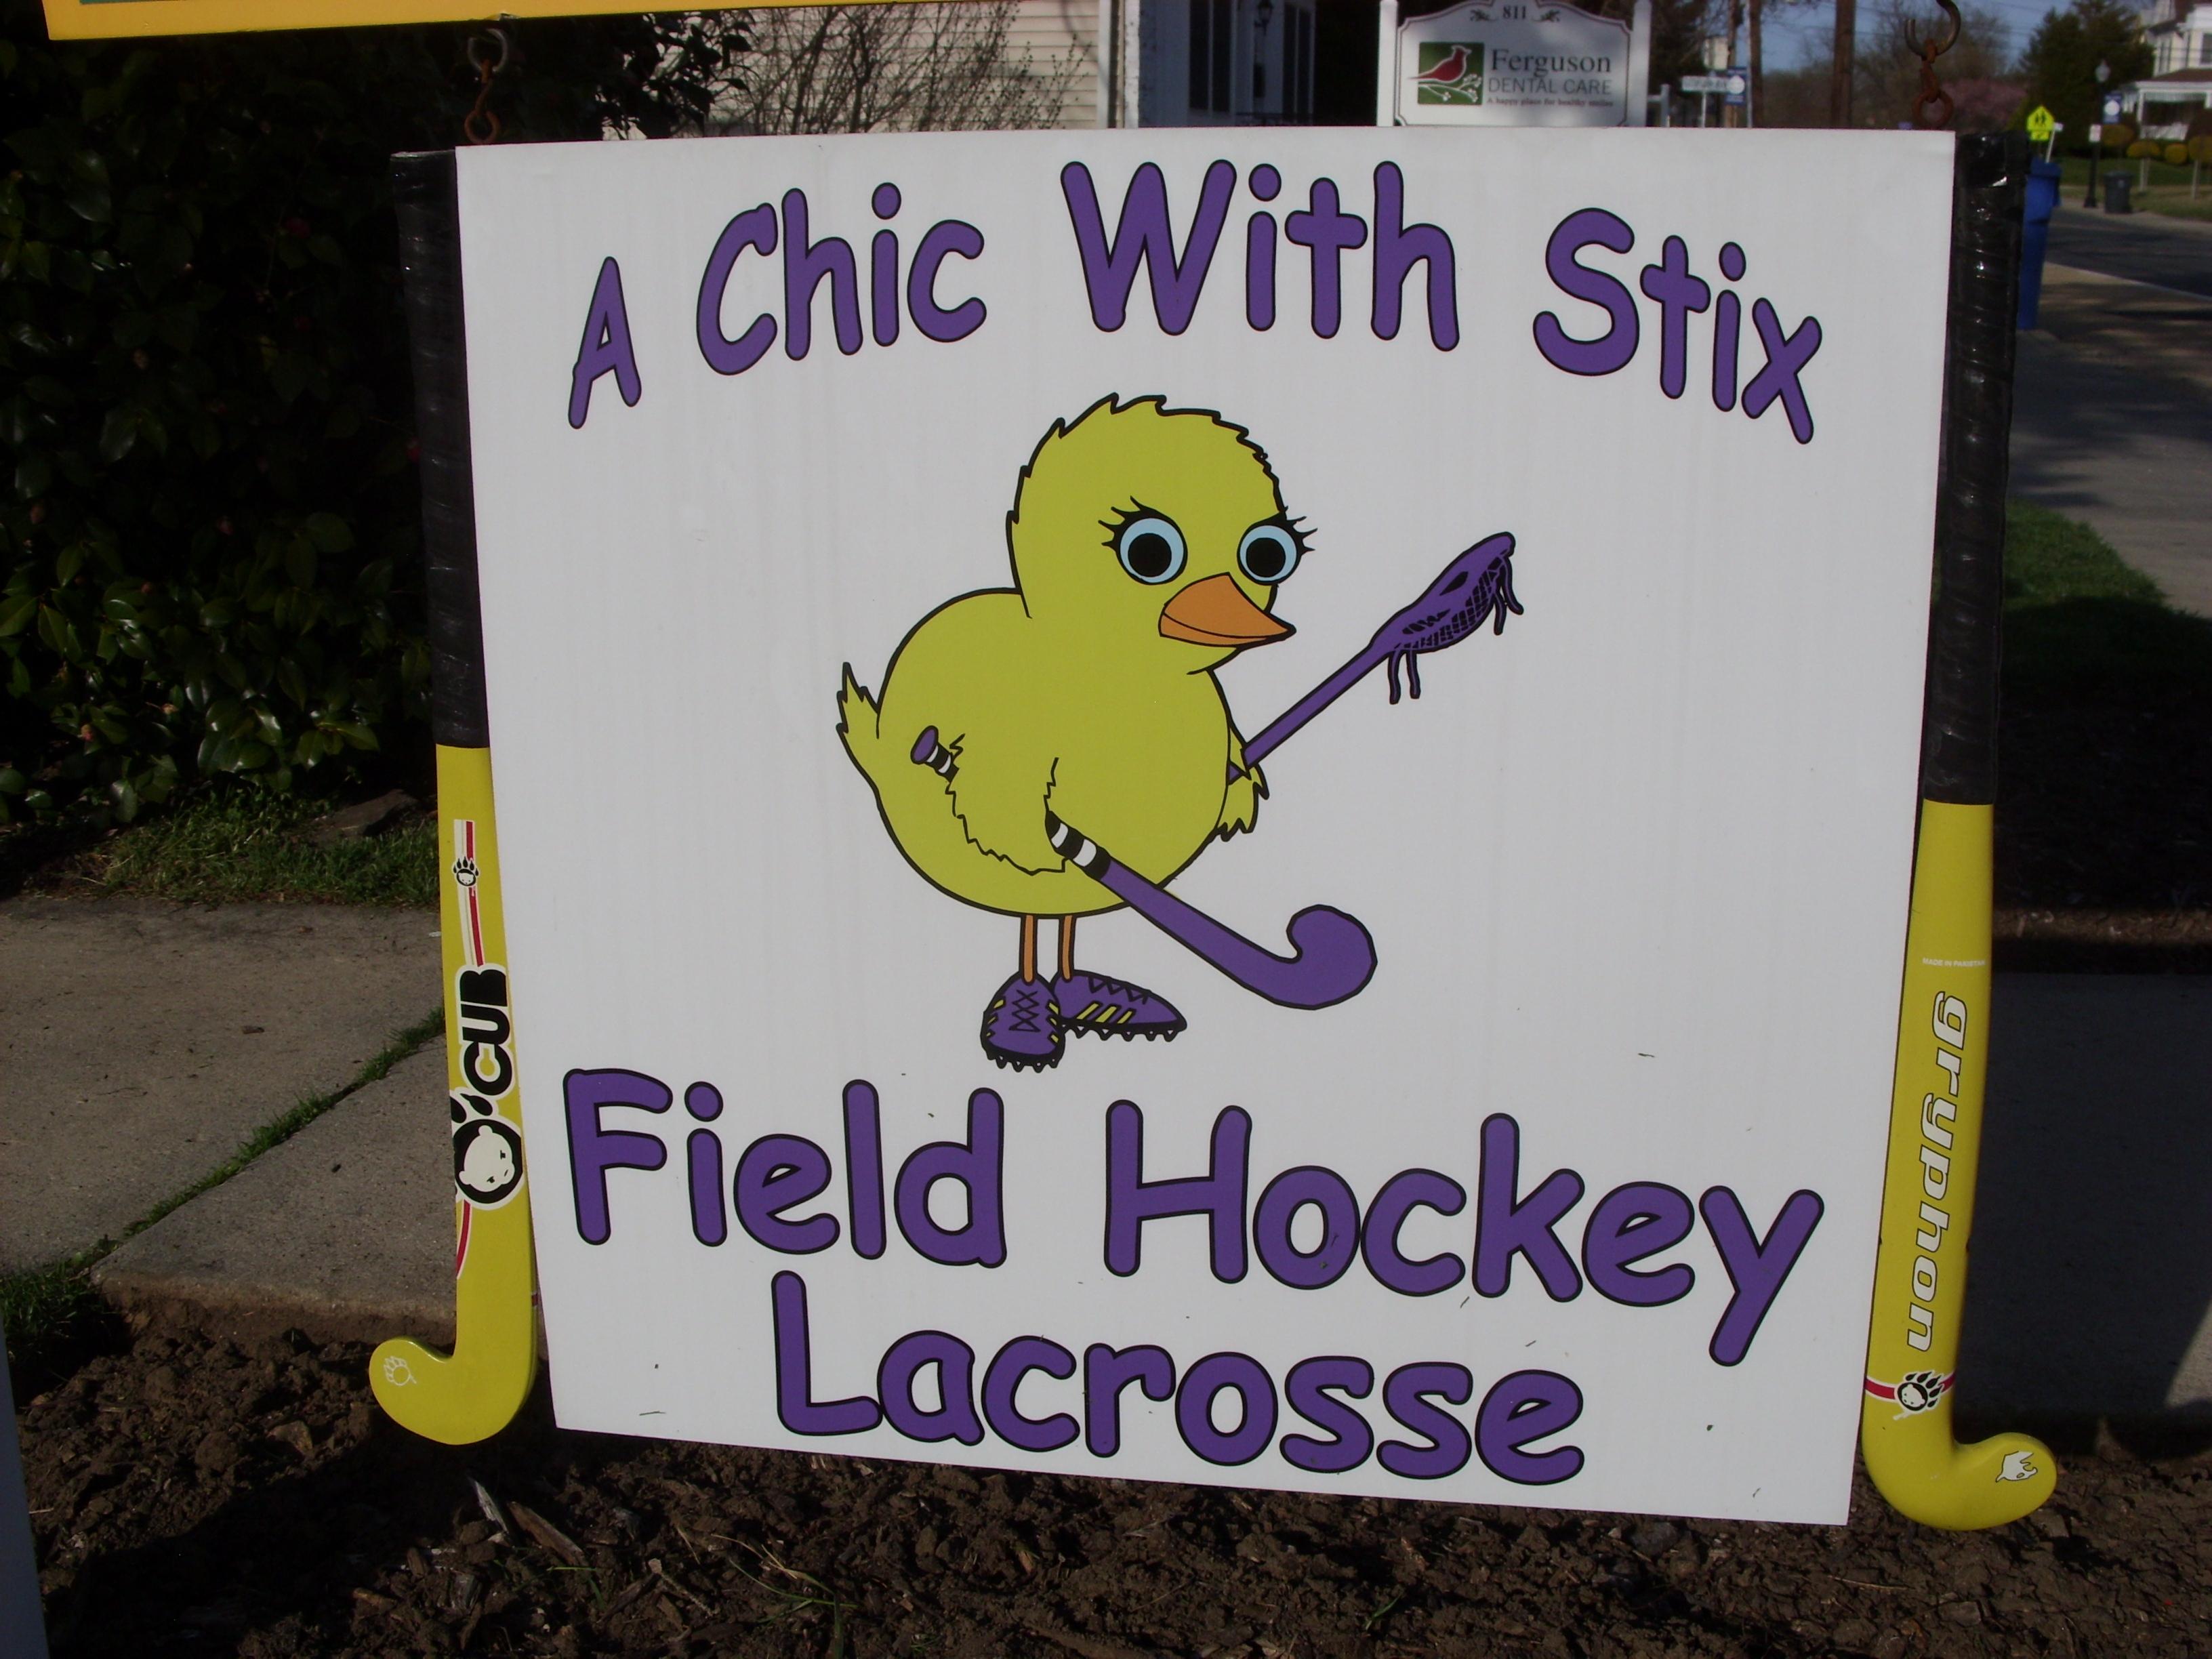 NJ Field Hockey and Lacrosse Equipment Store